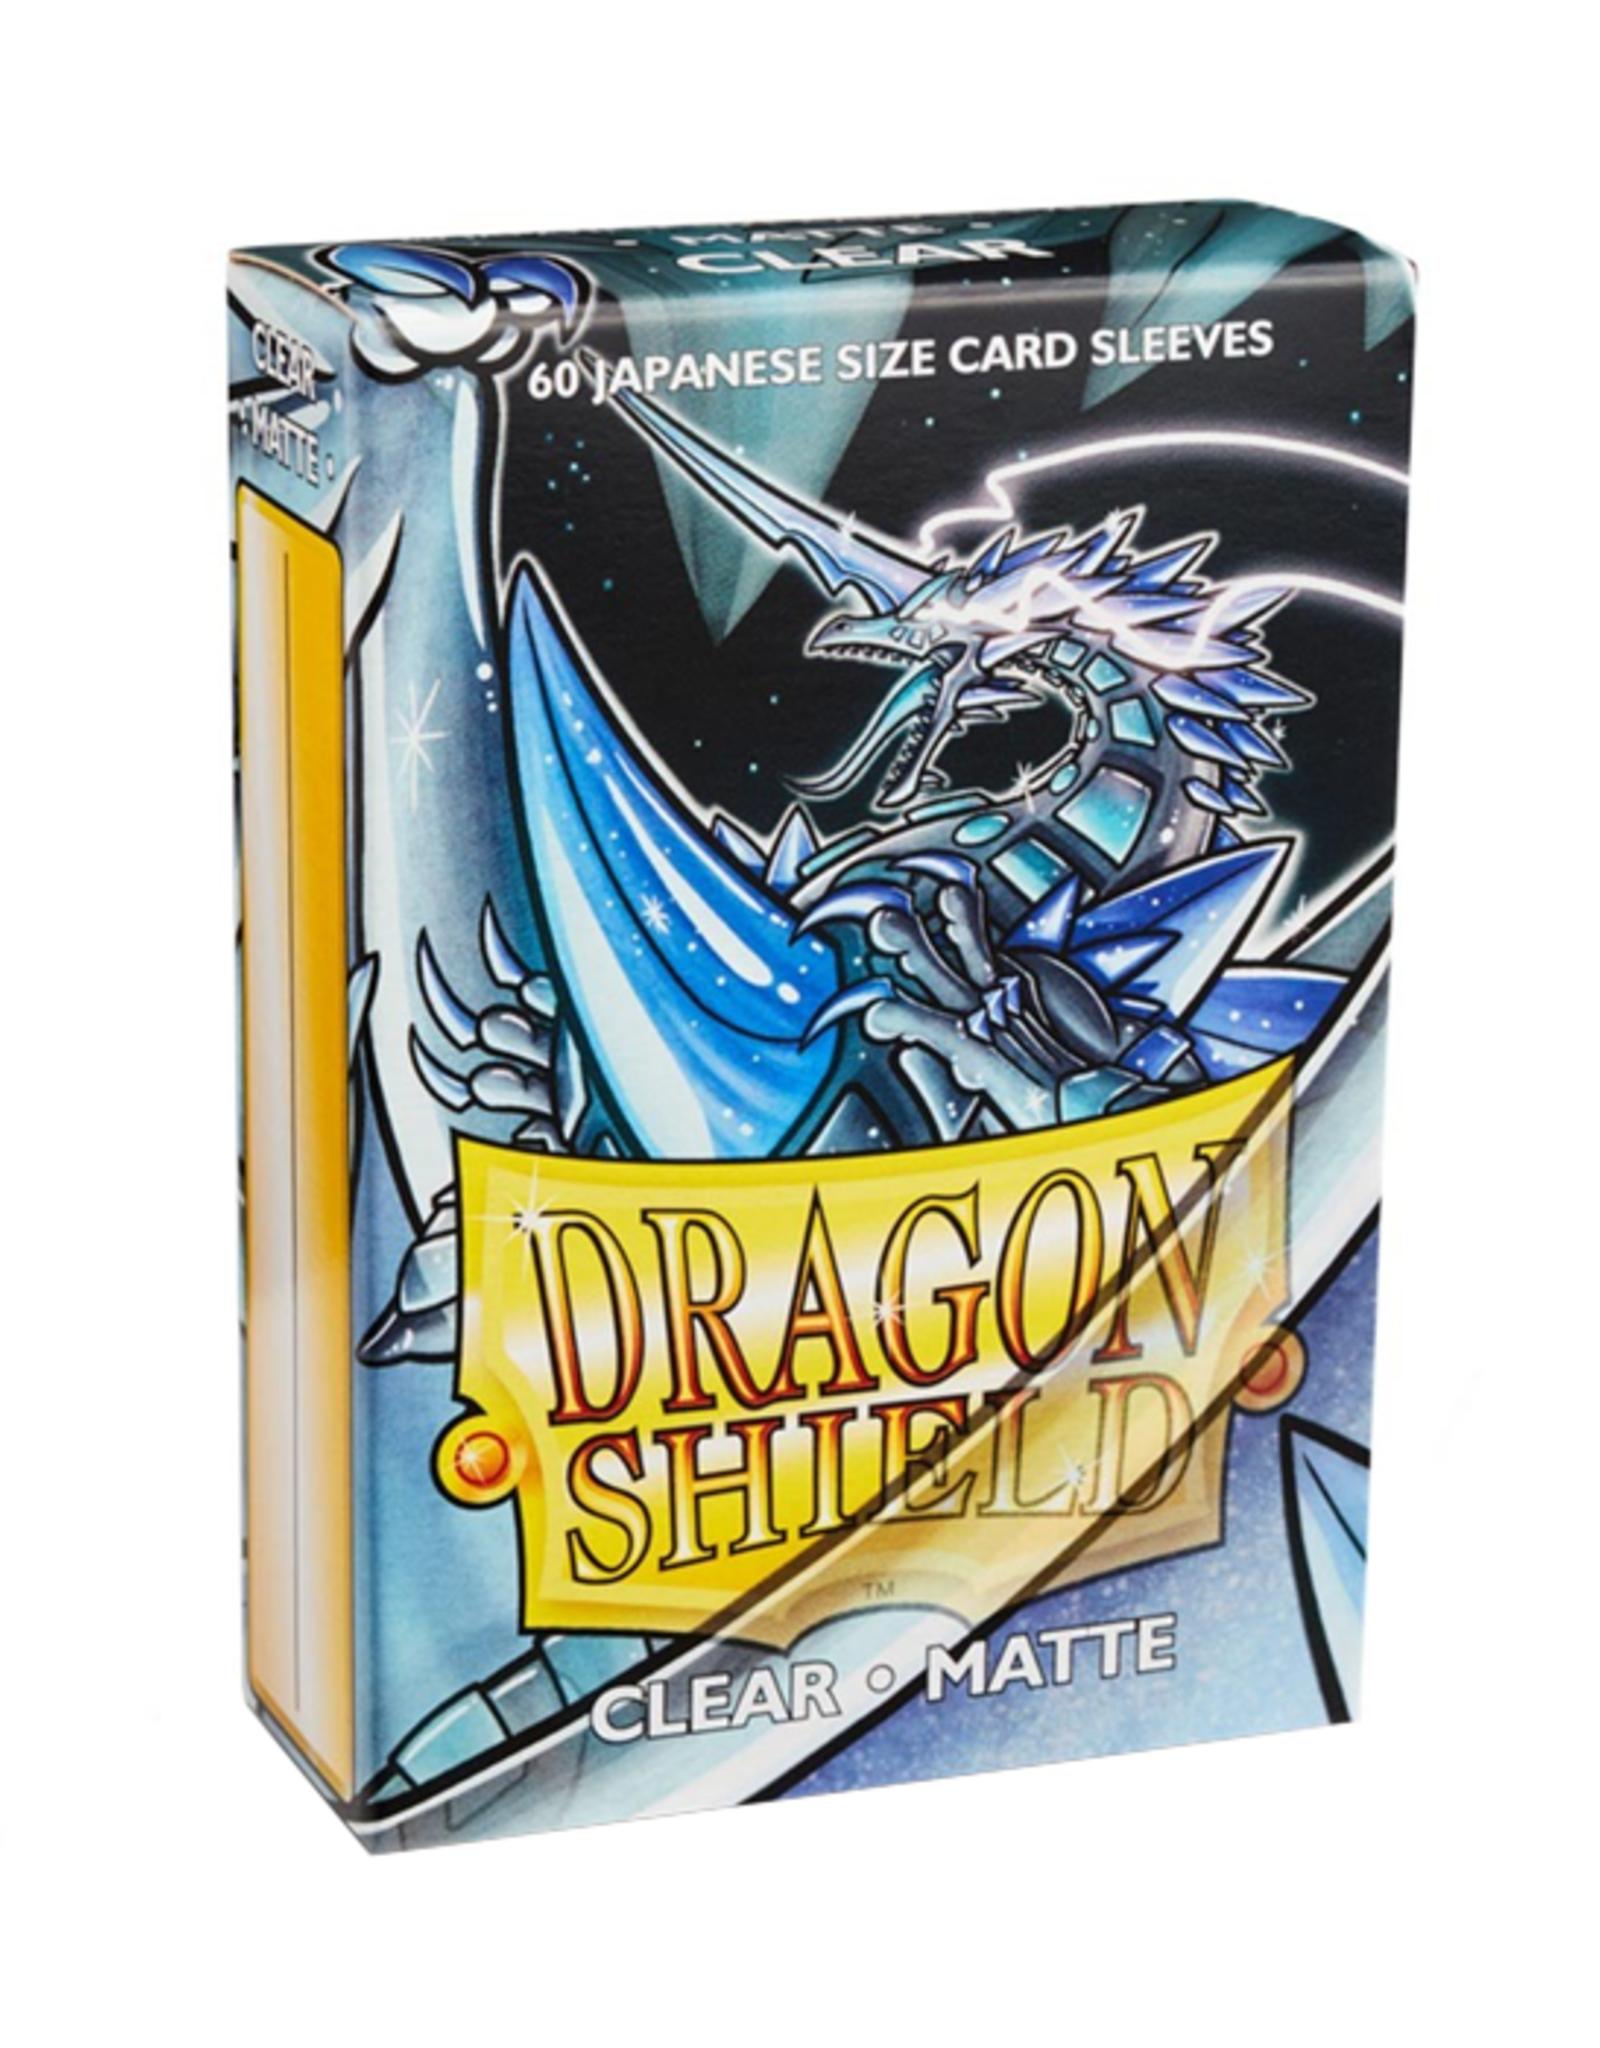 Dragon Shield Dragon Shield: Sleeves - Small - Matte - Clear (60)